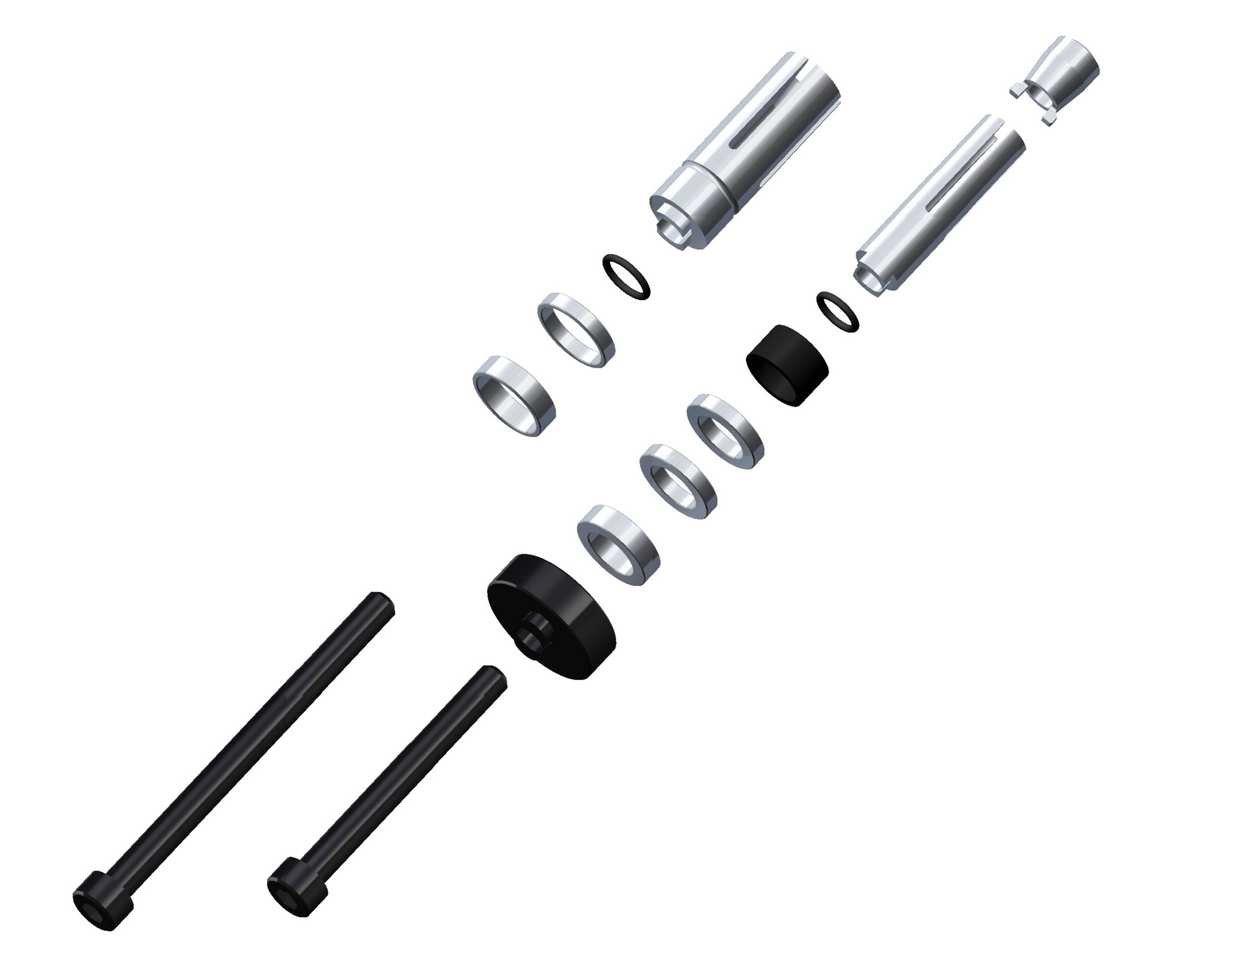 rizoma LP200B Adapter for Install Proguard rizoma on Handlebars Hole Diameter 13 –  21 mm, 1 Adapter 1Adapter